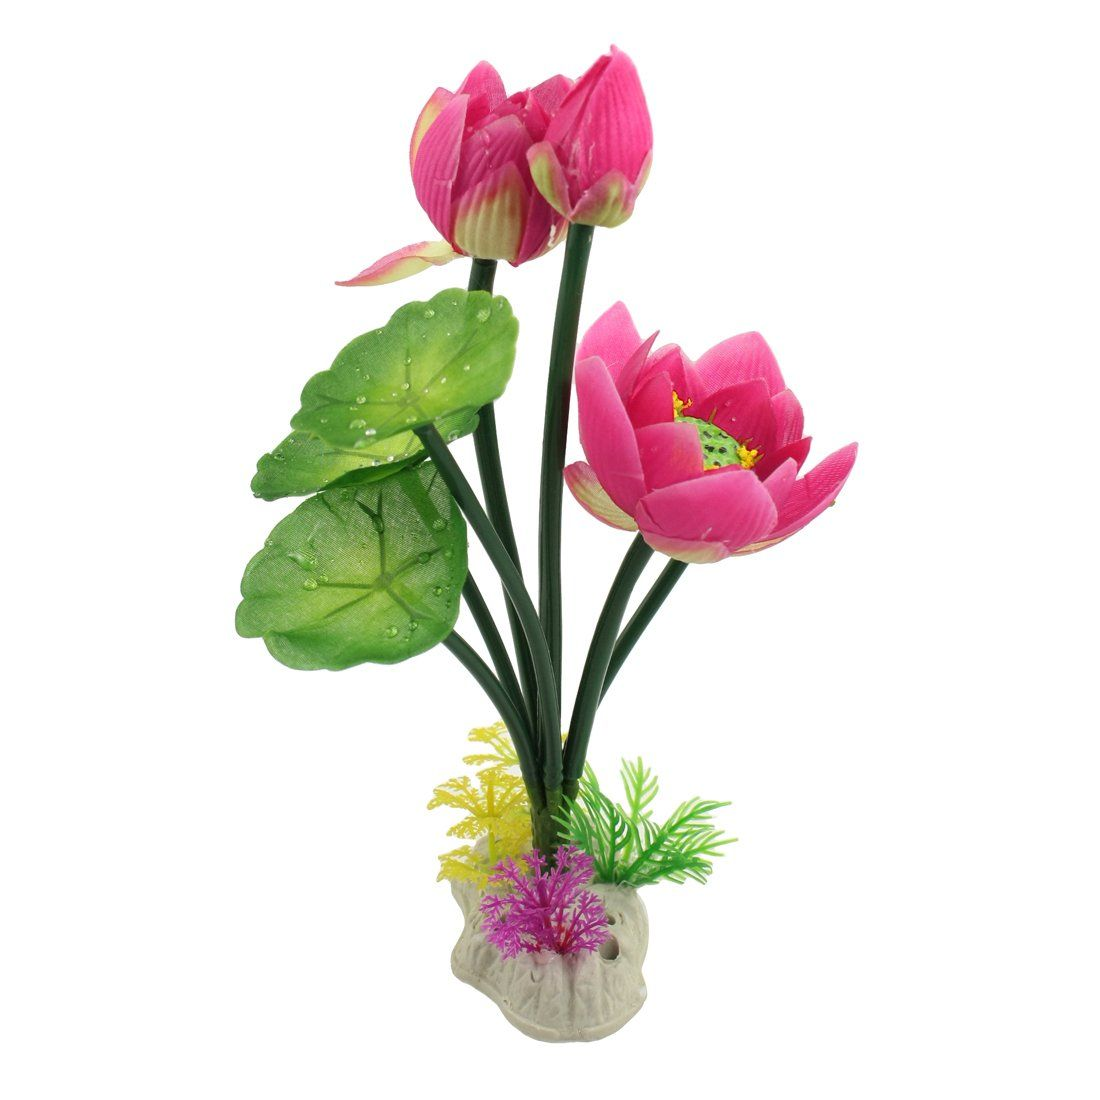 Jardin Plastic Artificial Lotus Leaf Flower Plants For Aquarium